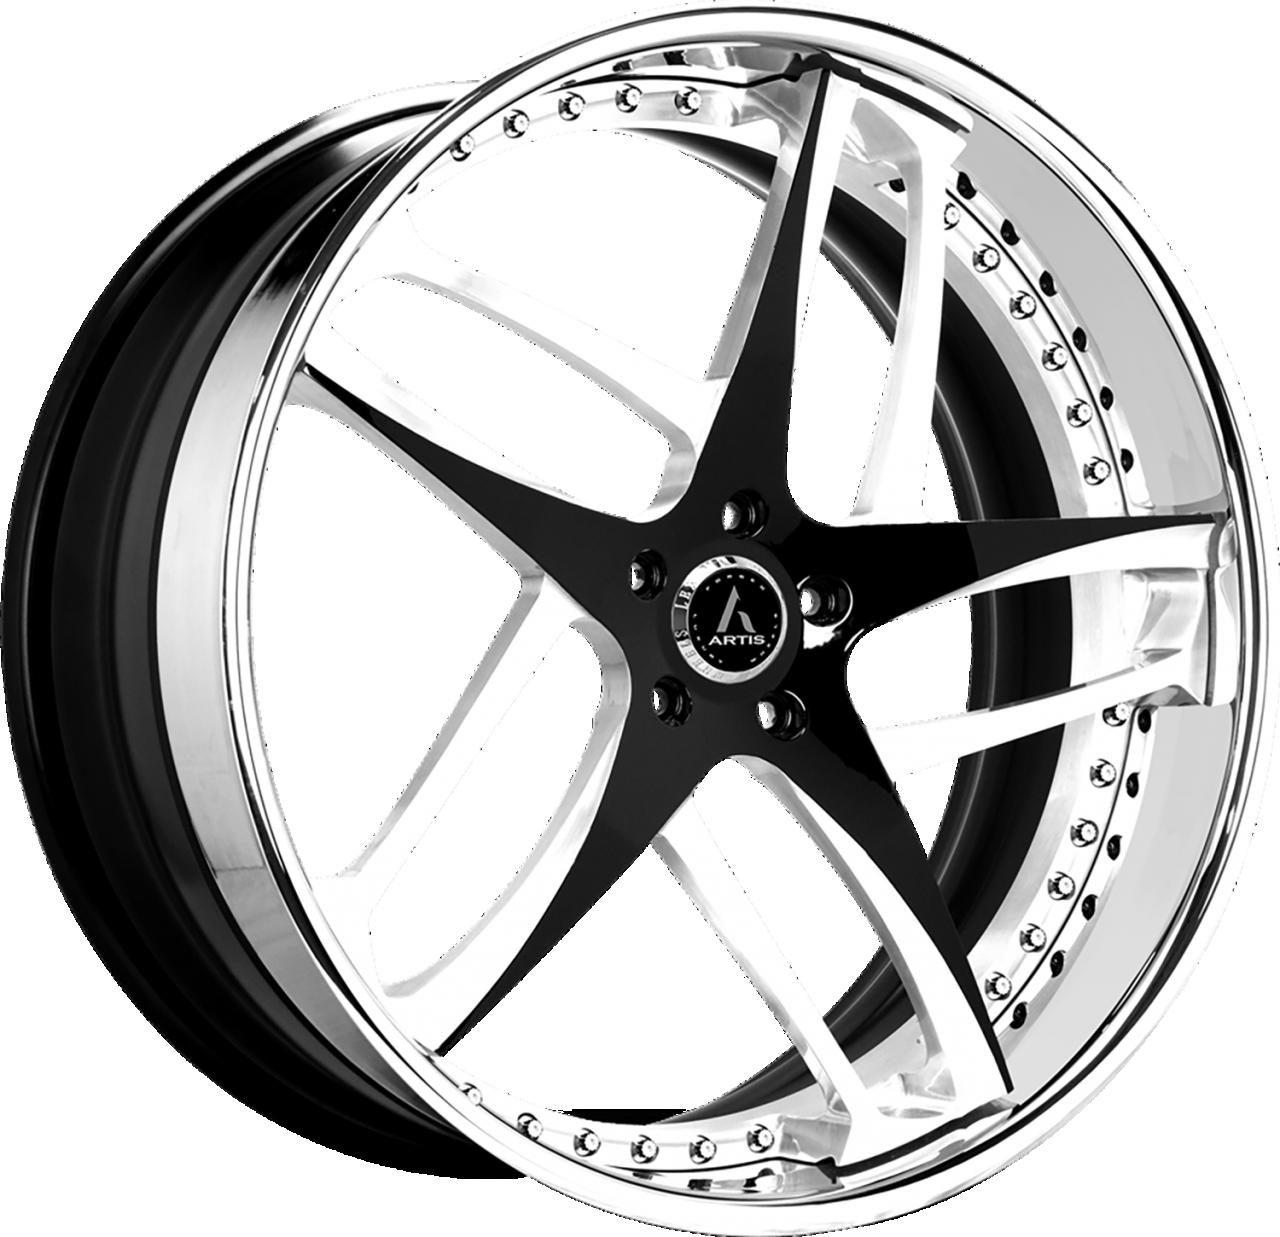 Artis Forged Bavaria wheel with Custom Black and White finish